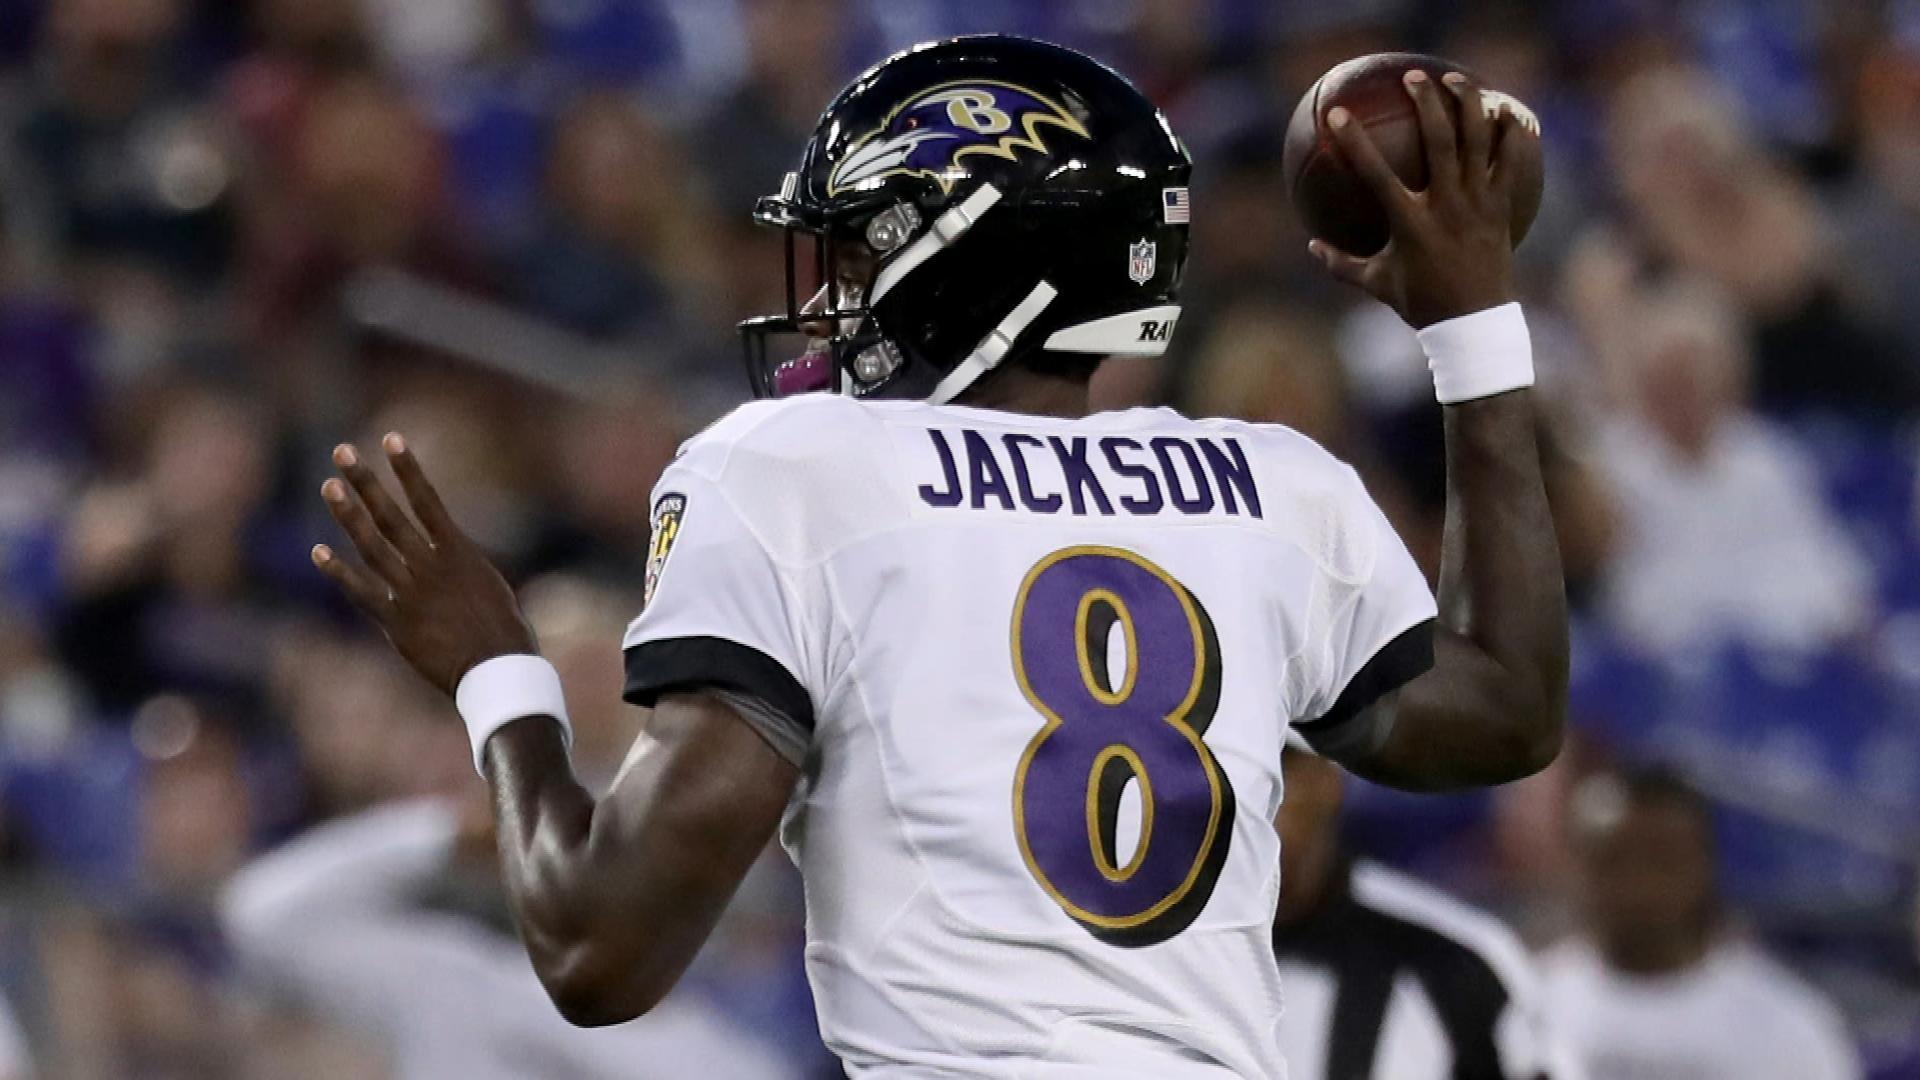 Baltimore Ravens face tough decision at QB with Joe Flacco, Lamar Jackson